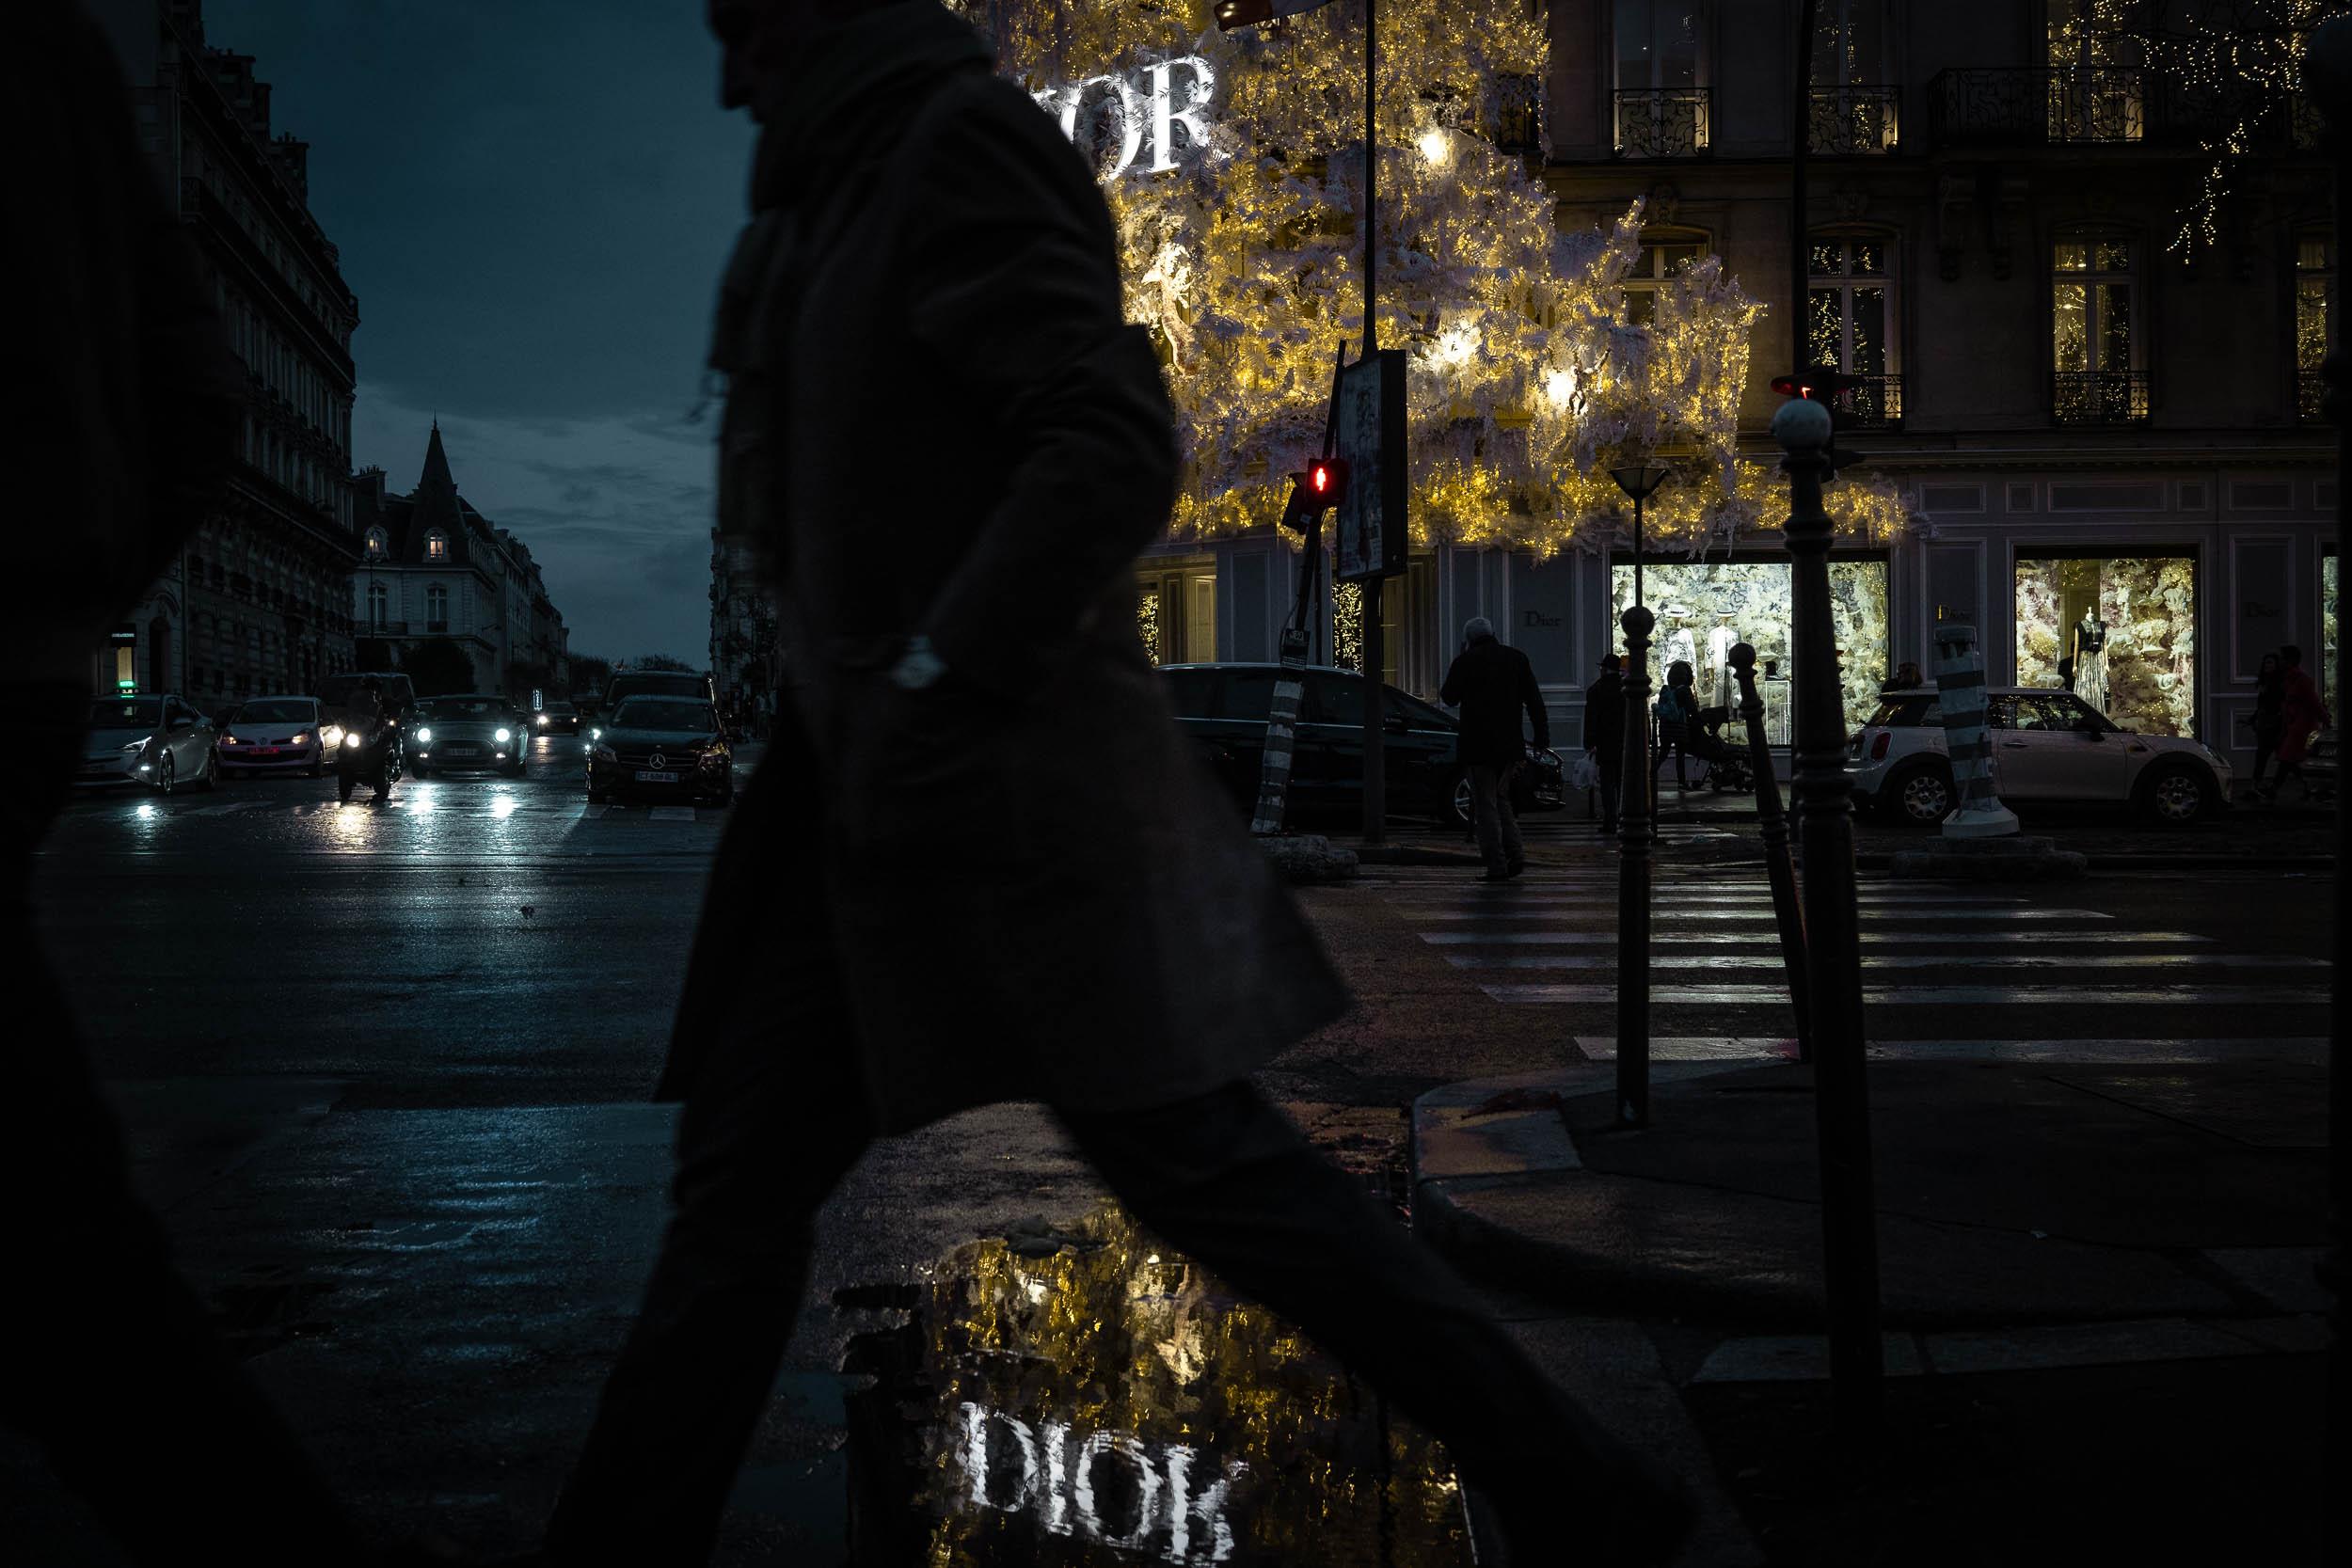 Paris-evenin-light-man-crossing-street.jpg